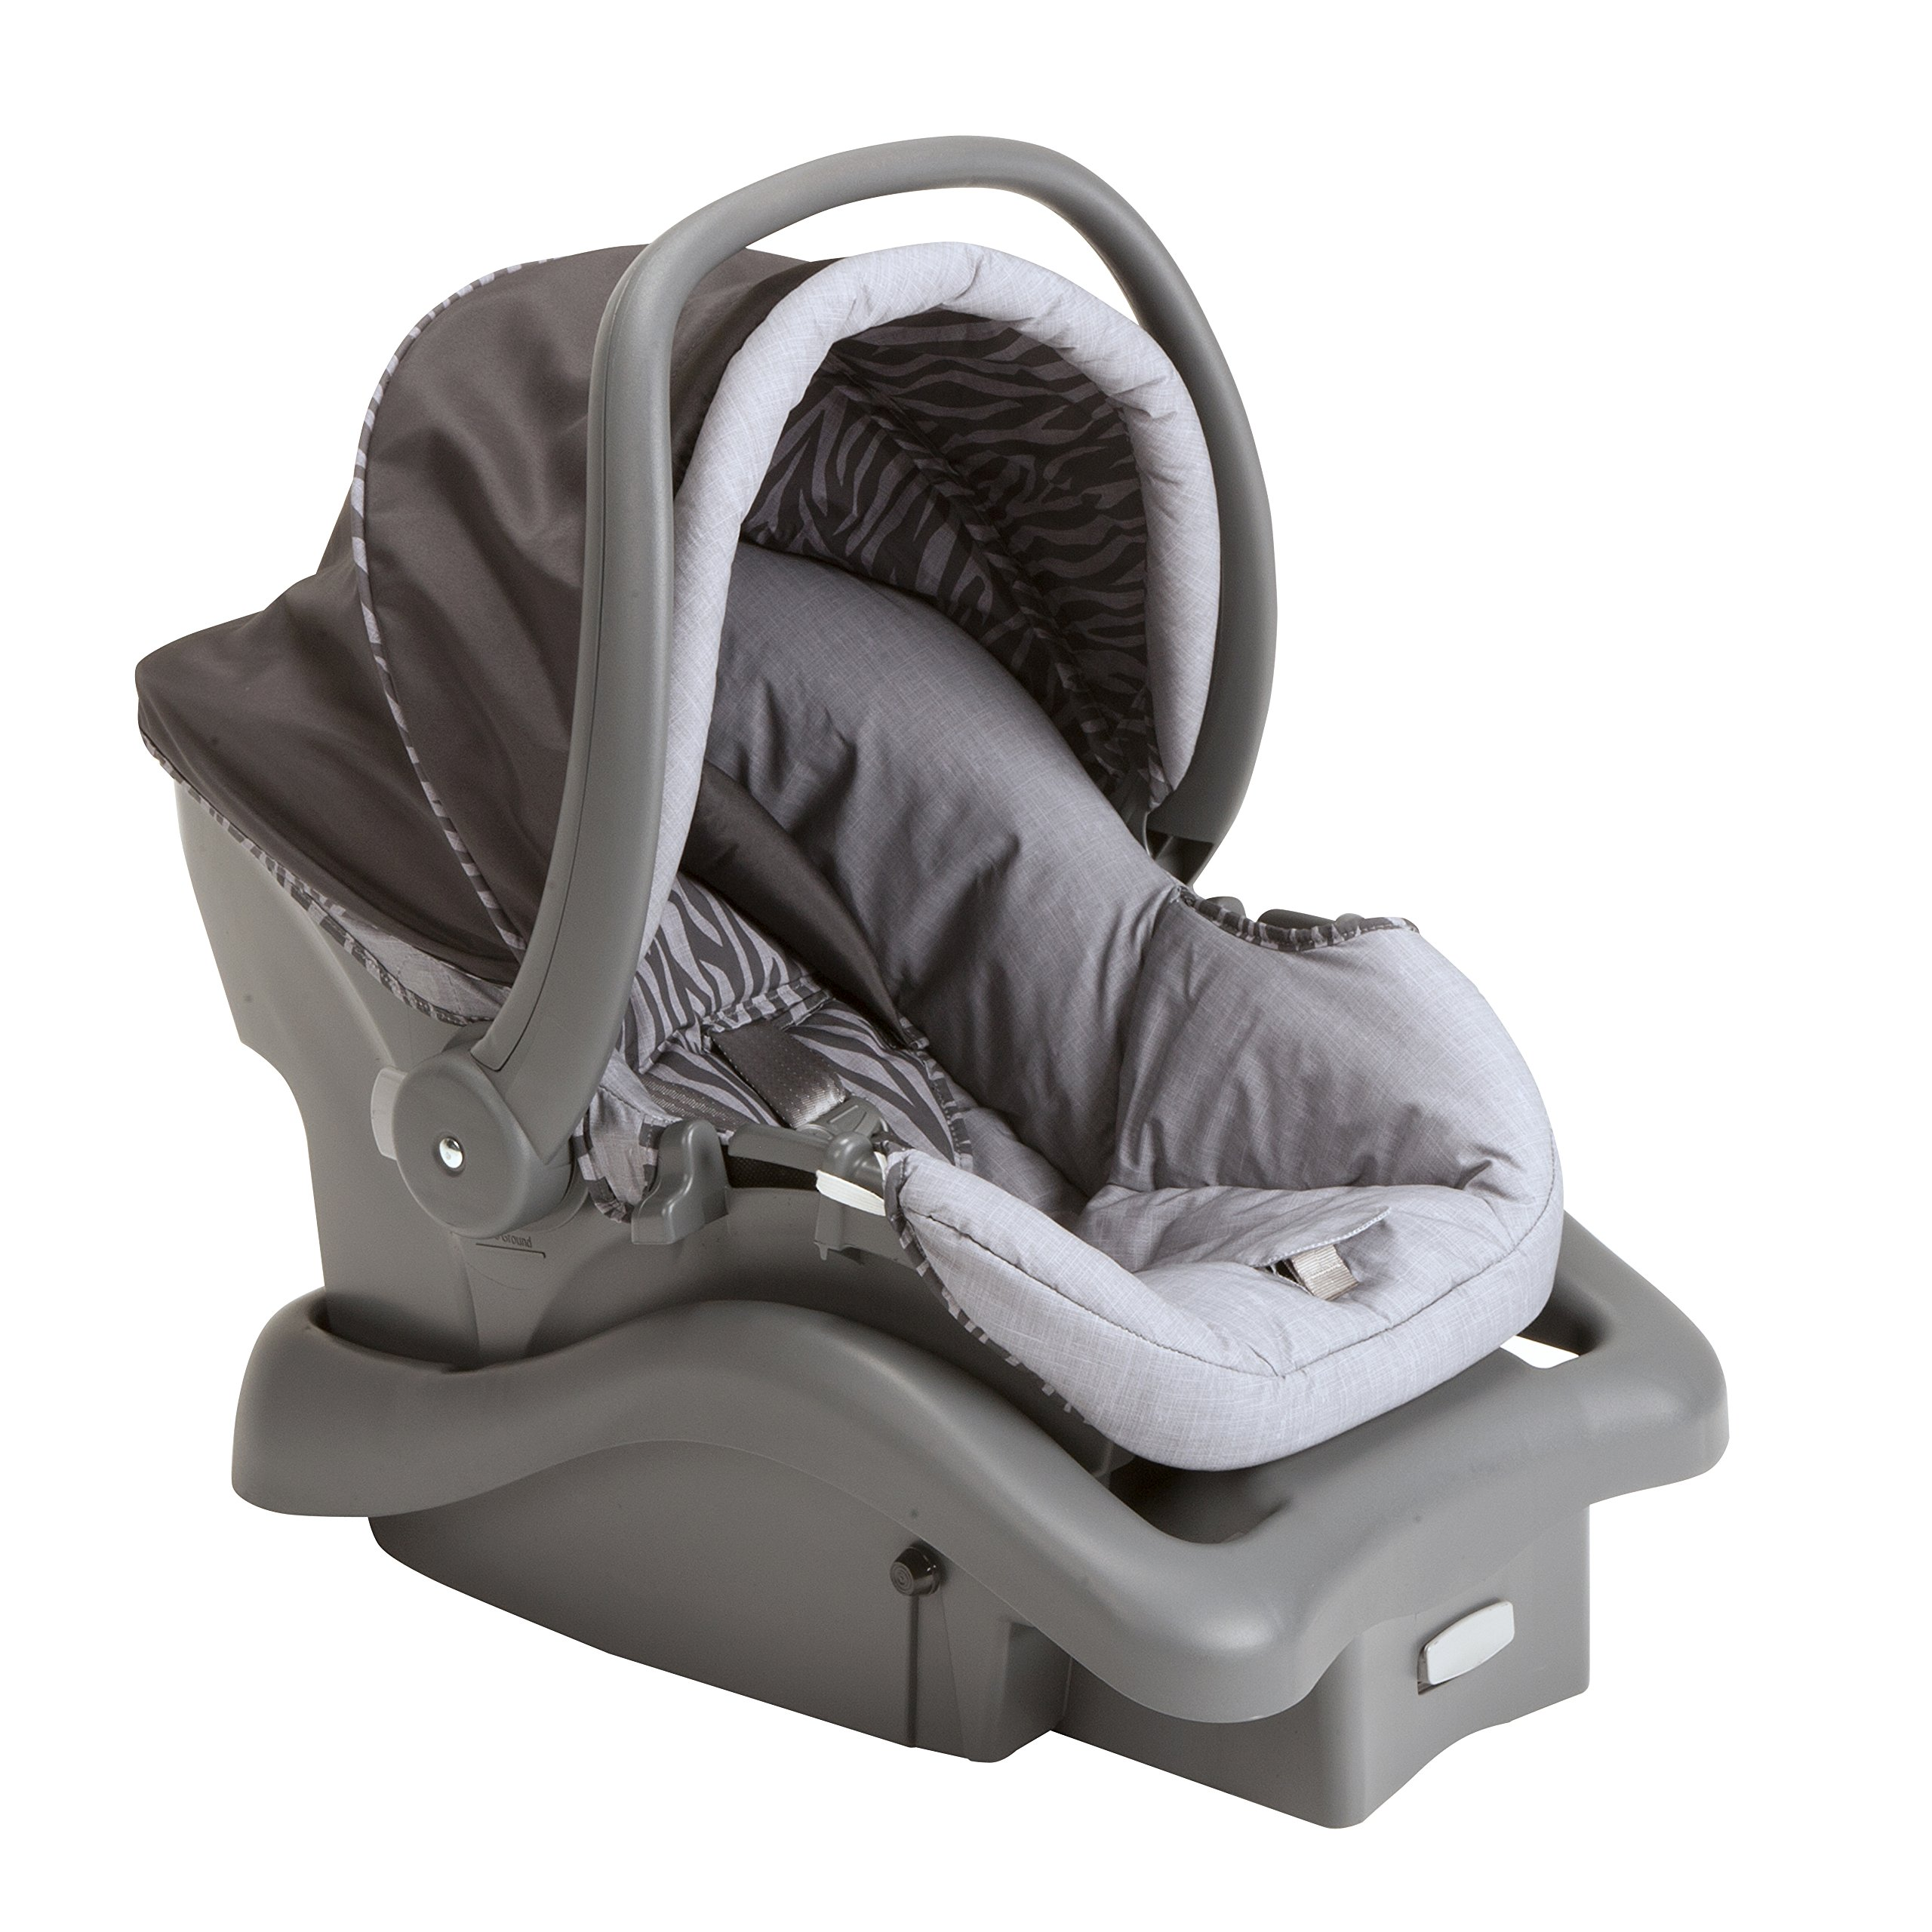 Cosco Light N' Comfy Car Seat, Ziva